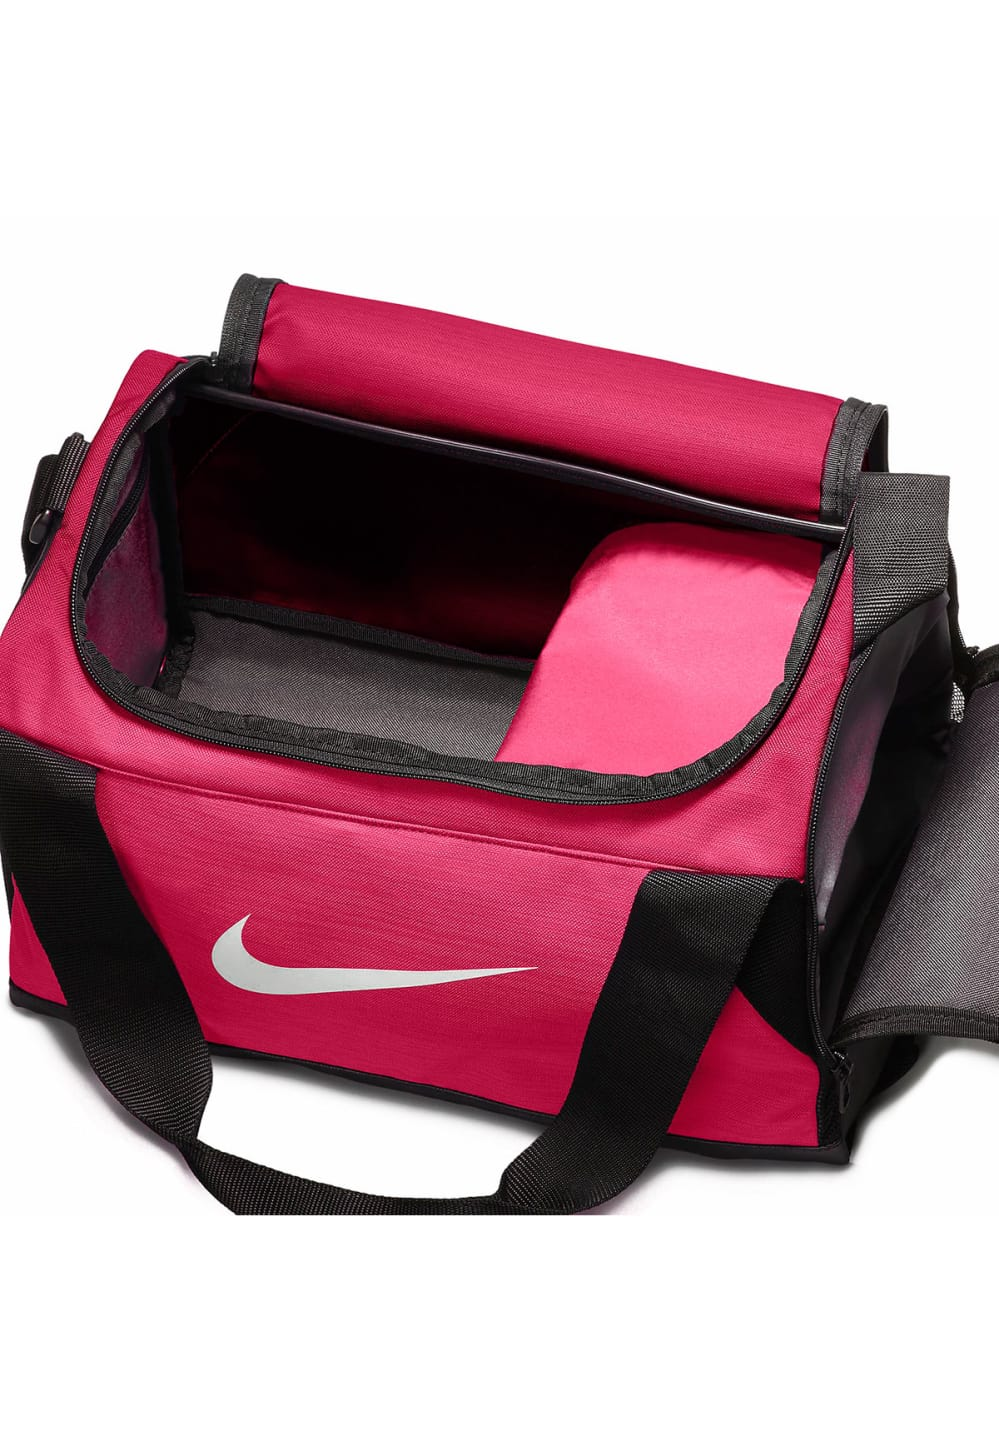 Nike Brasilia (extra-small) Duffel Bag - Sporttaschen - Pink